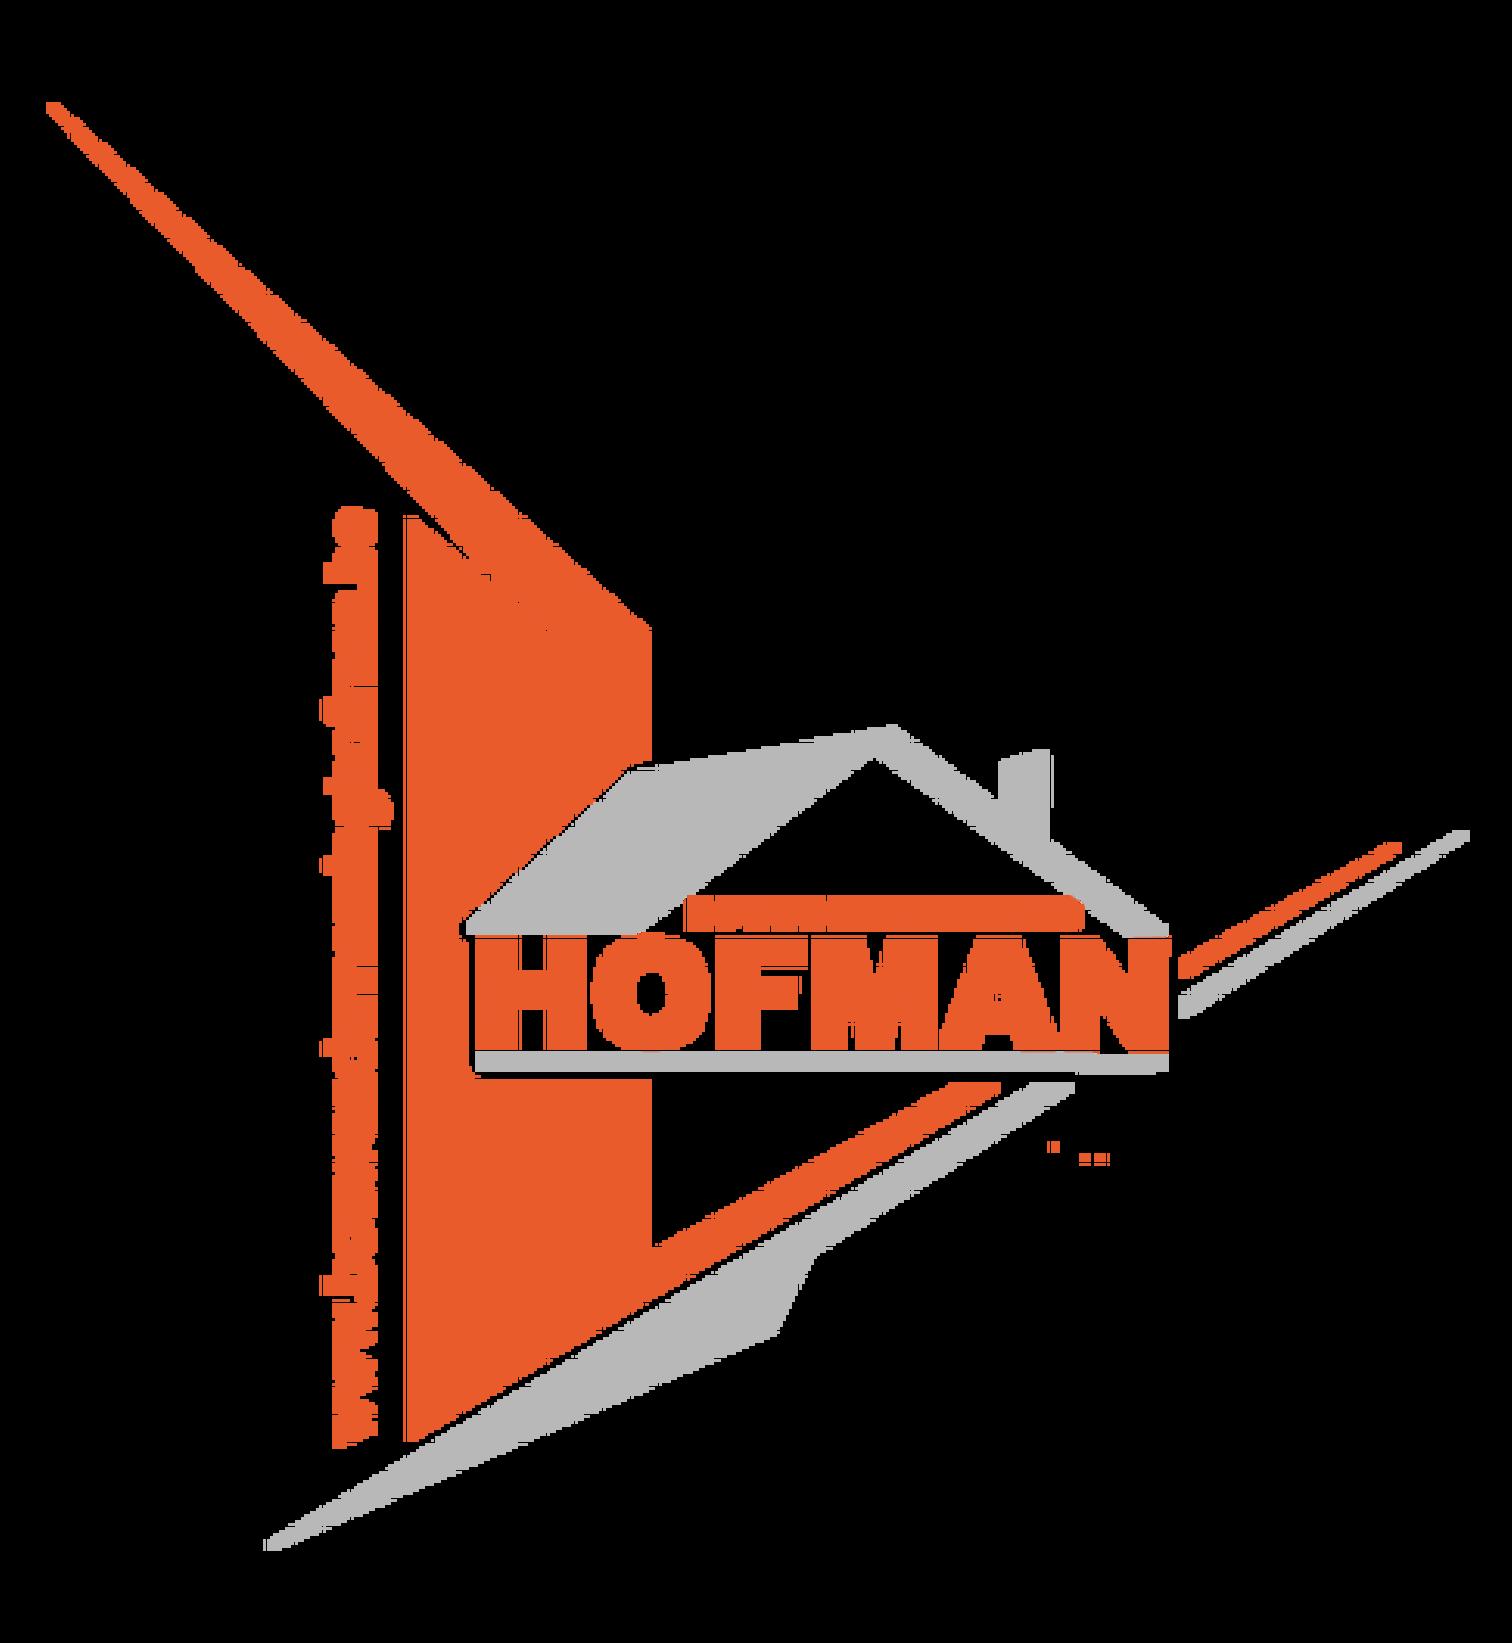 logo Bouwonderneming Hofman